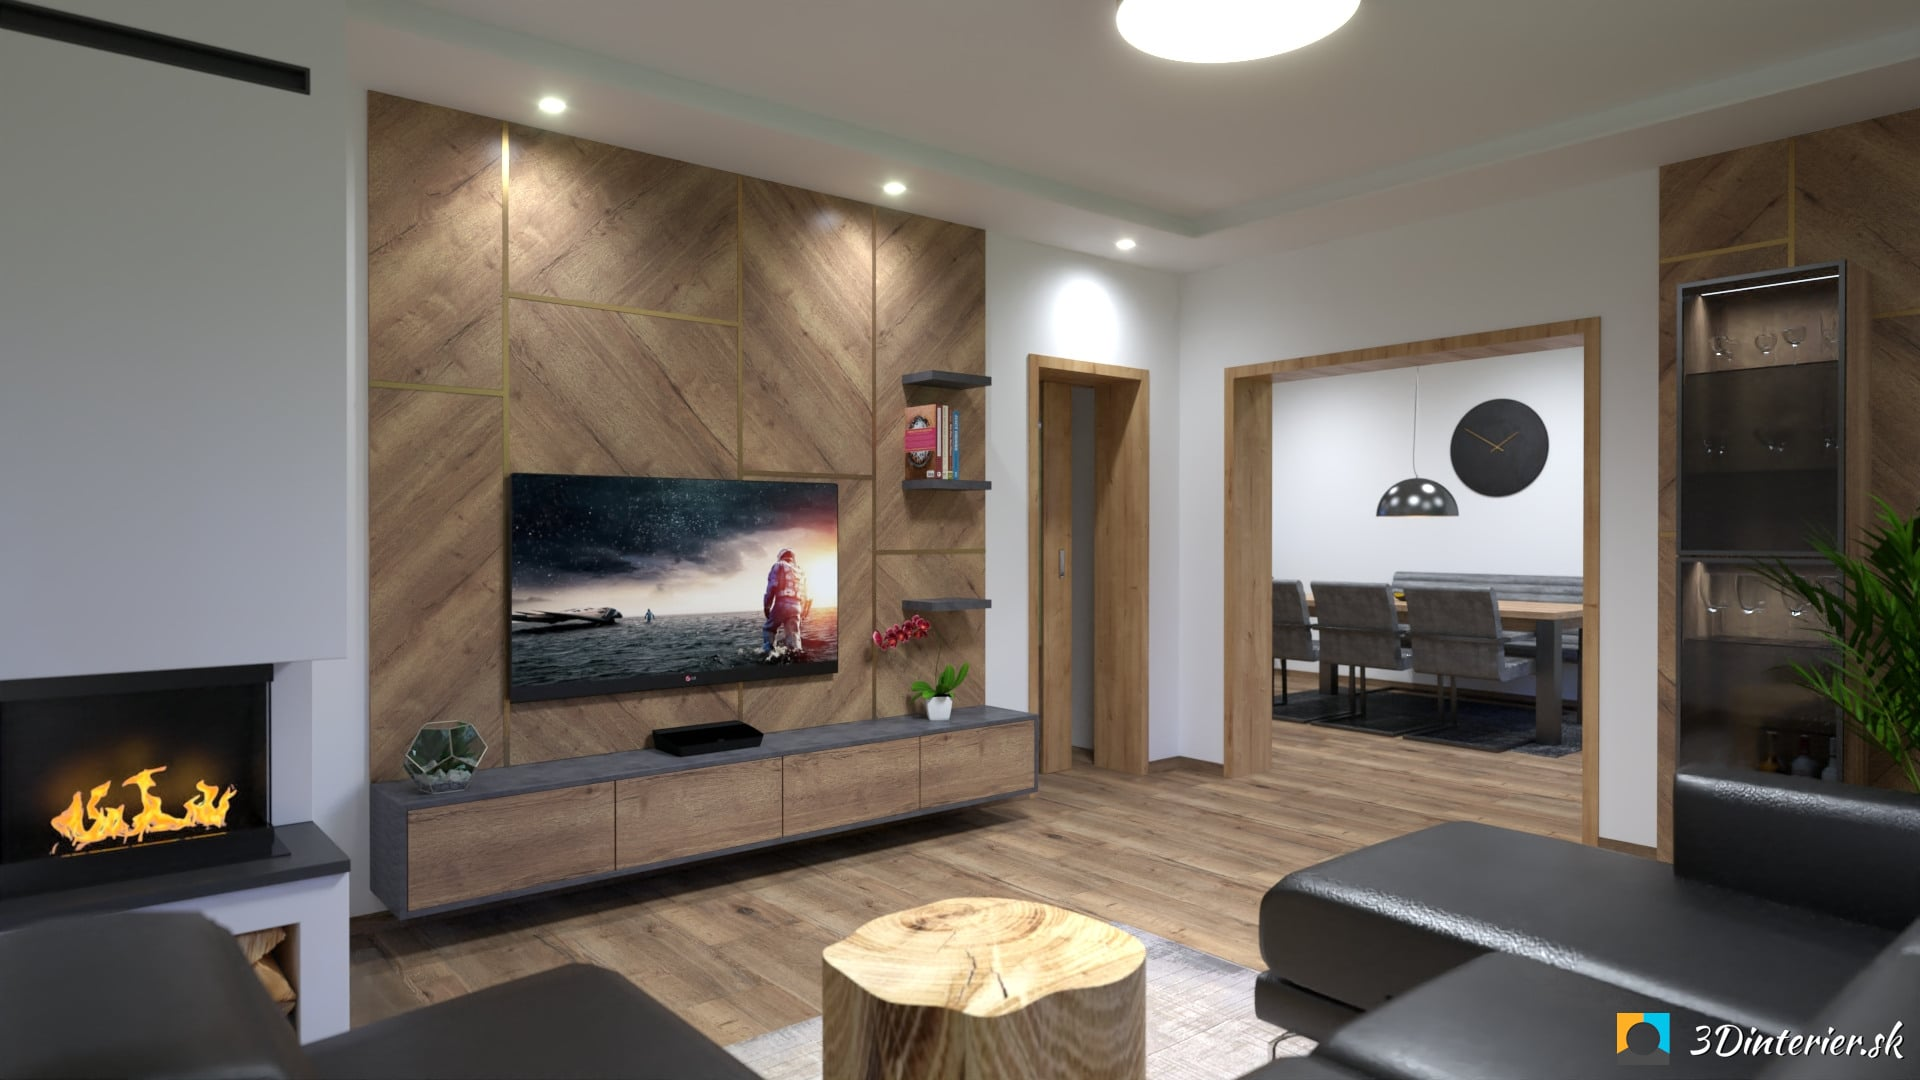 Industriálna kuchyňa s jedálňou a obývacia izba REG